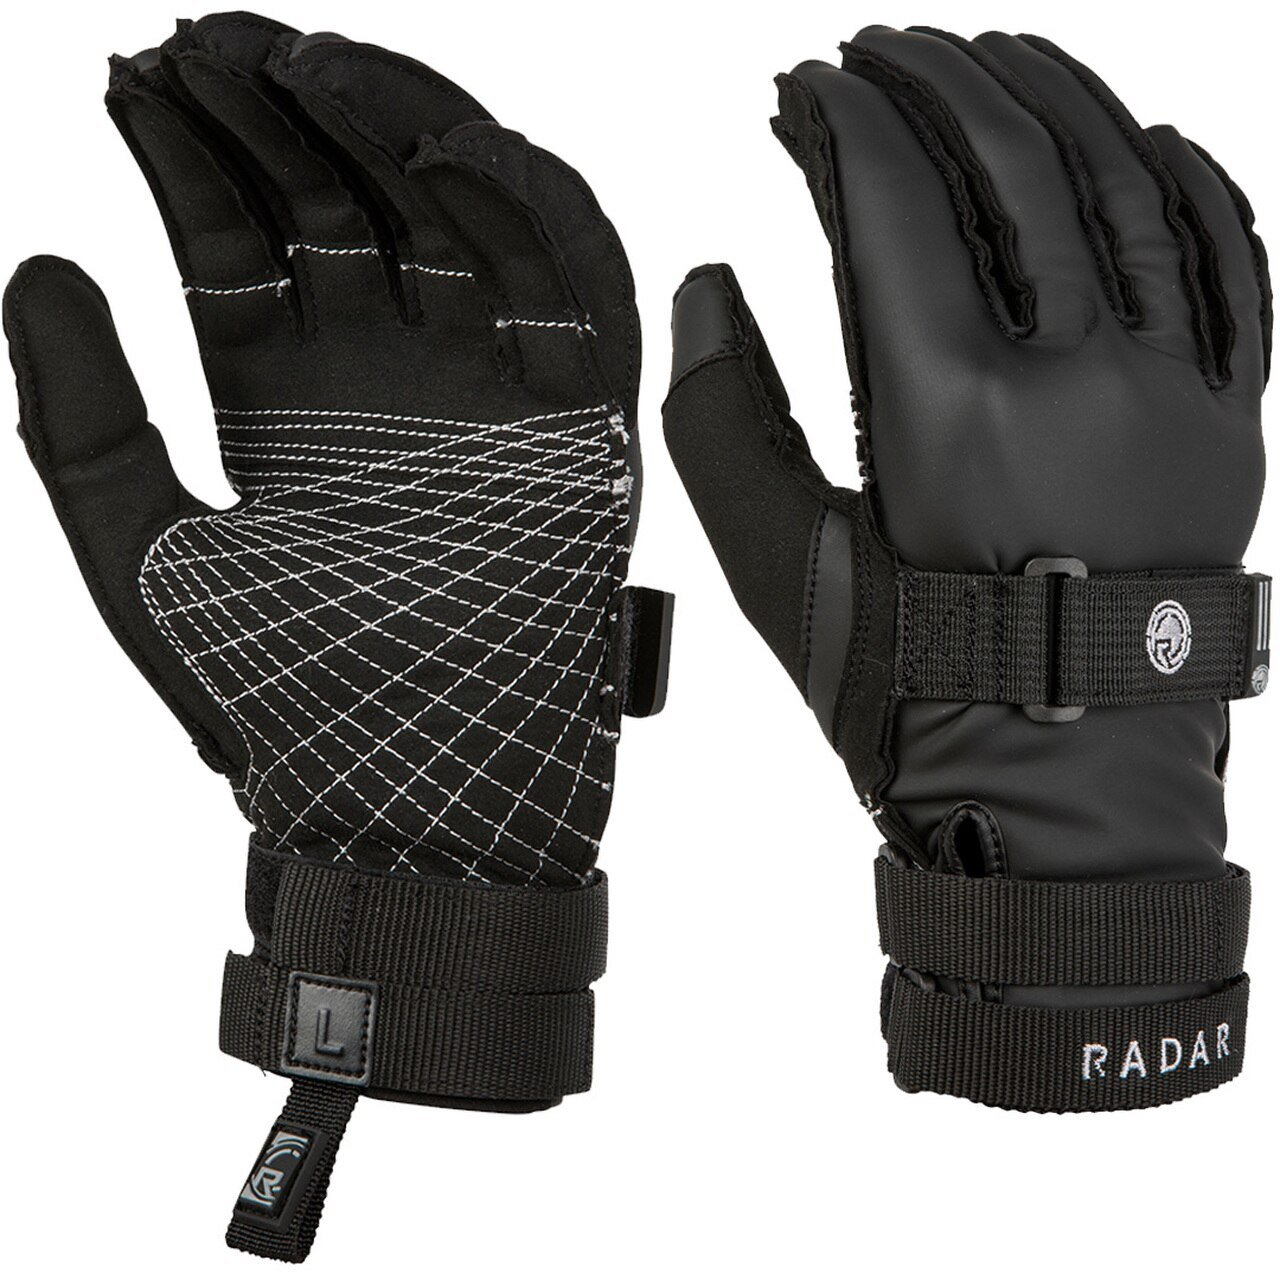 Radar Atlas Inside/Out Glove